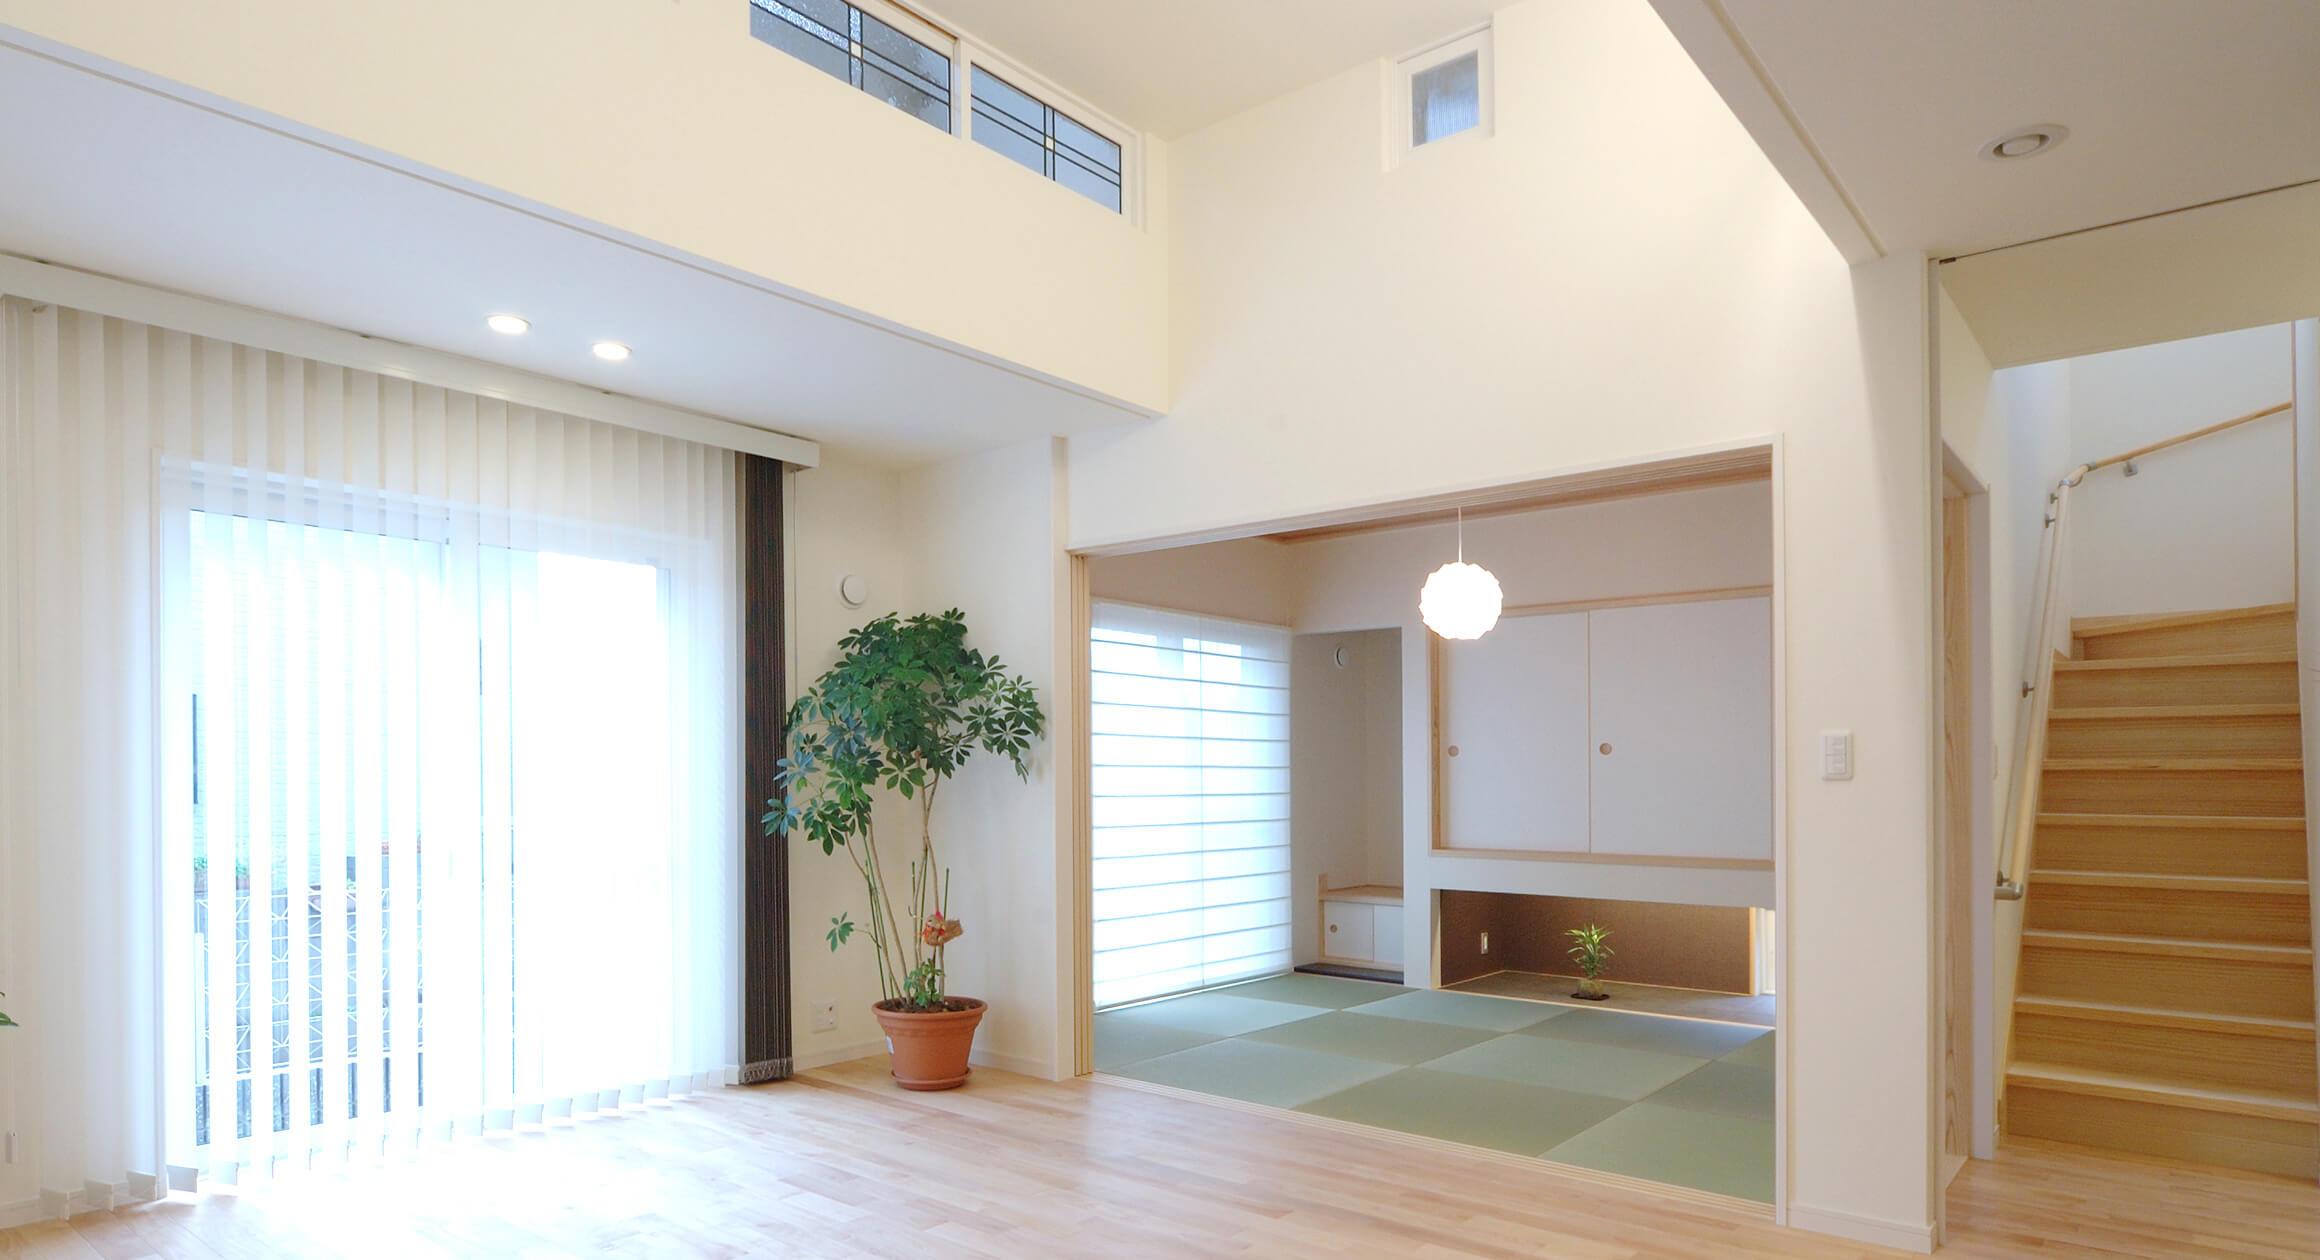 三友工務店の新築注文住宅 熊本市W様邸